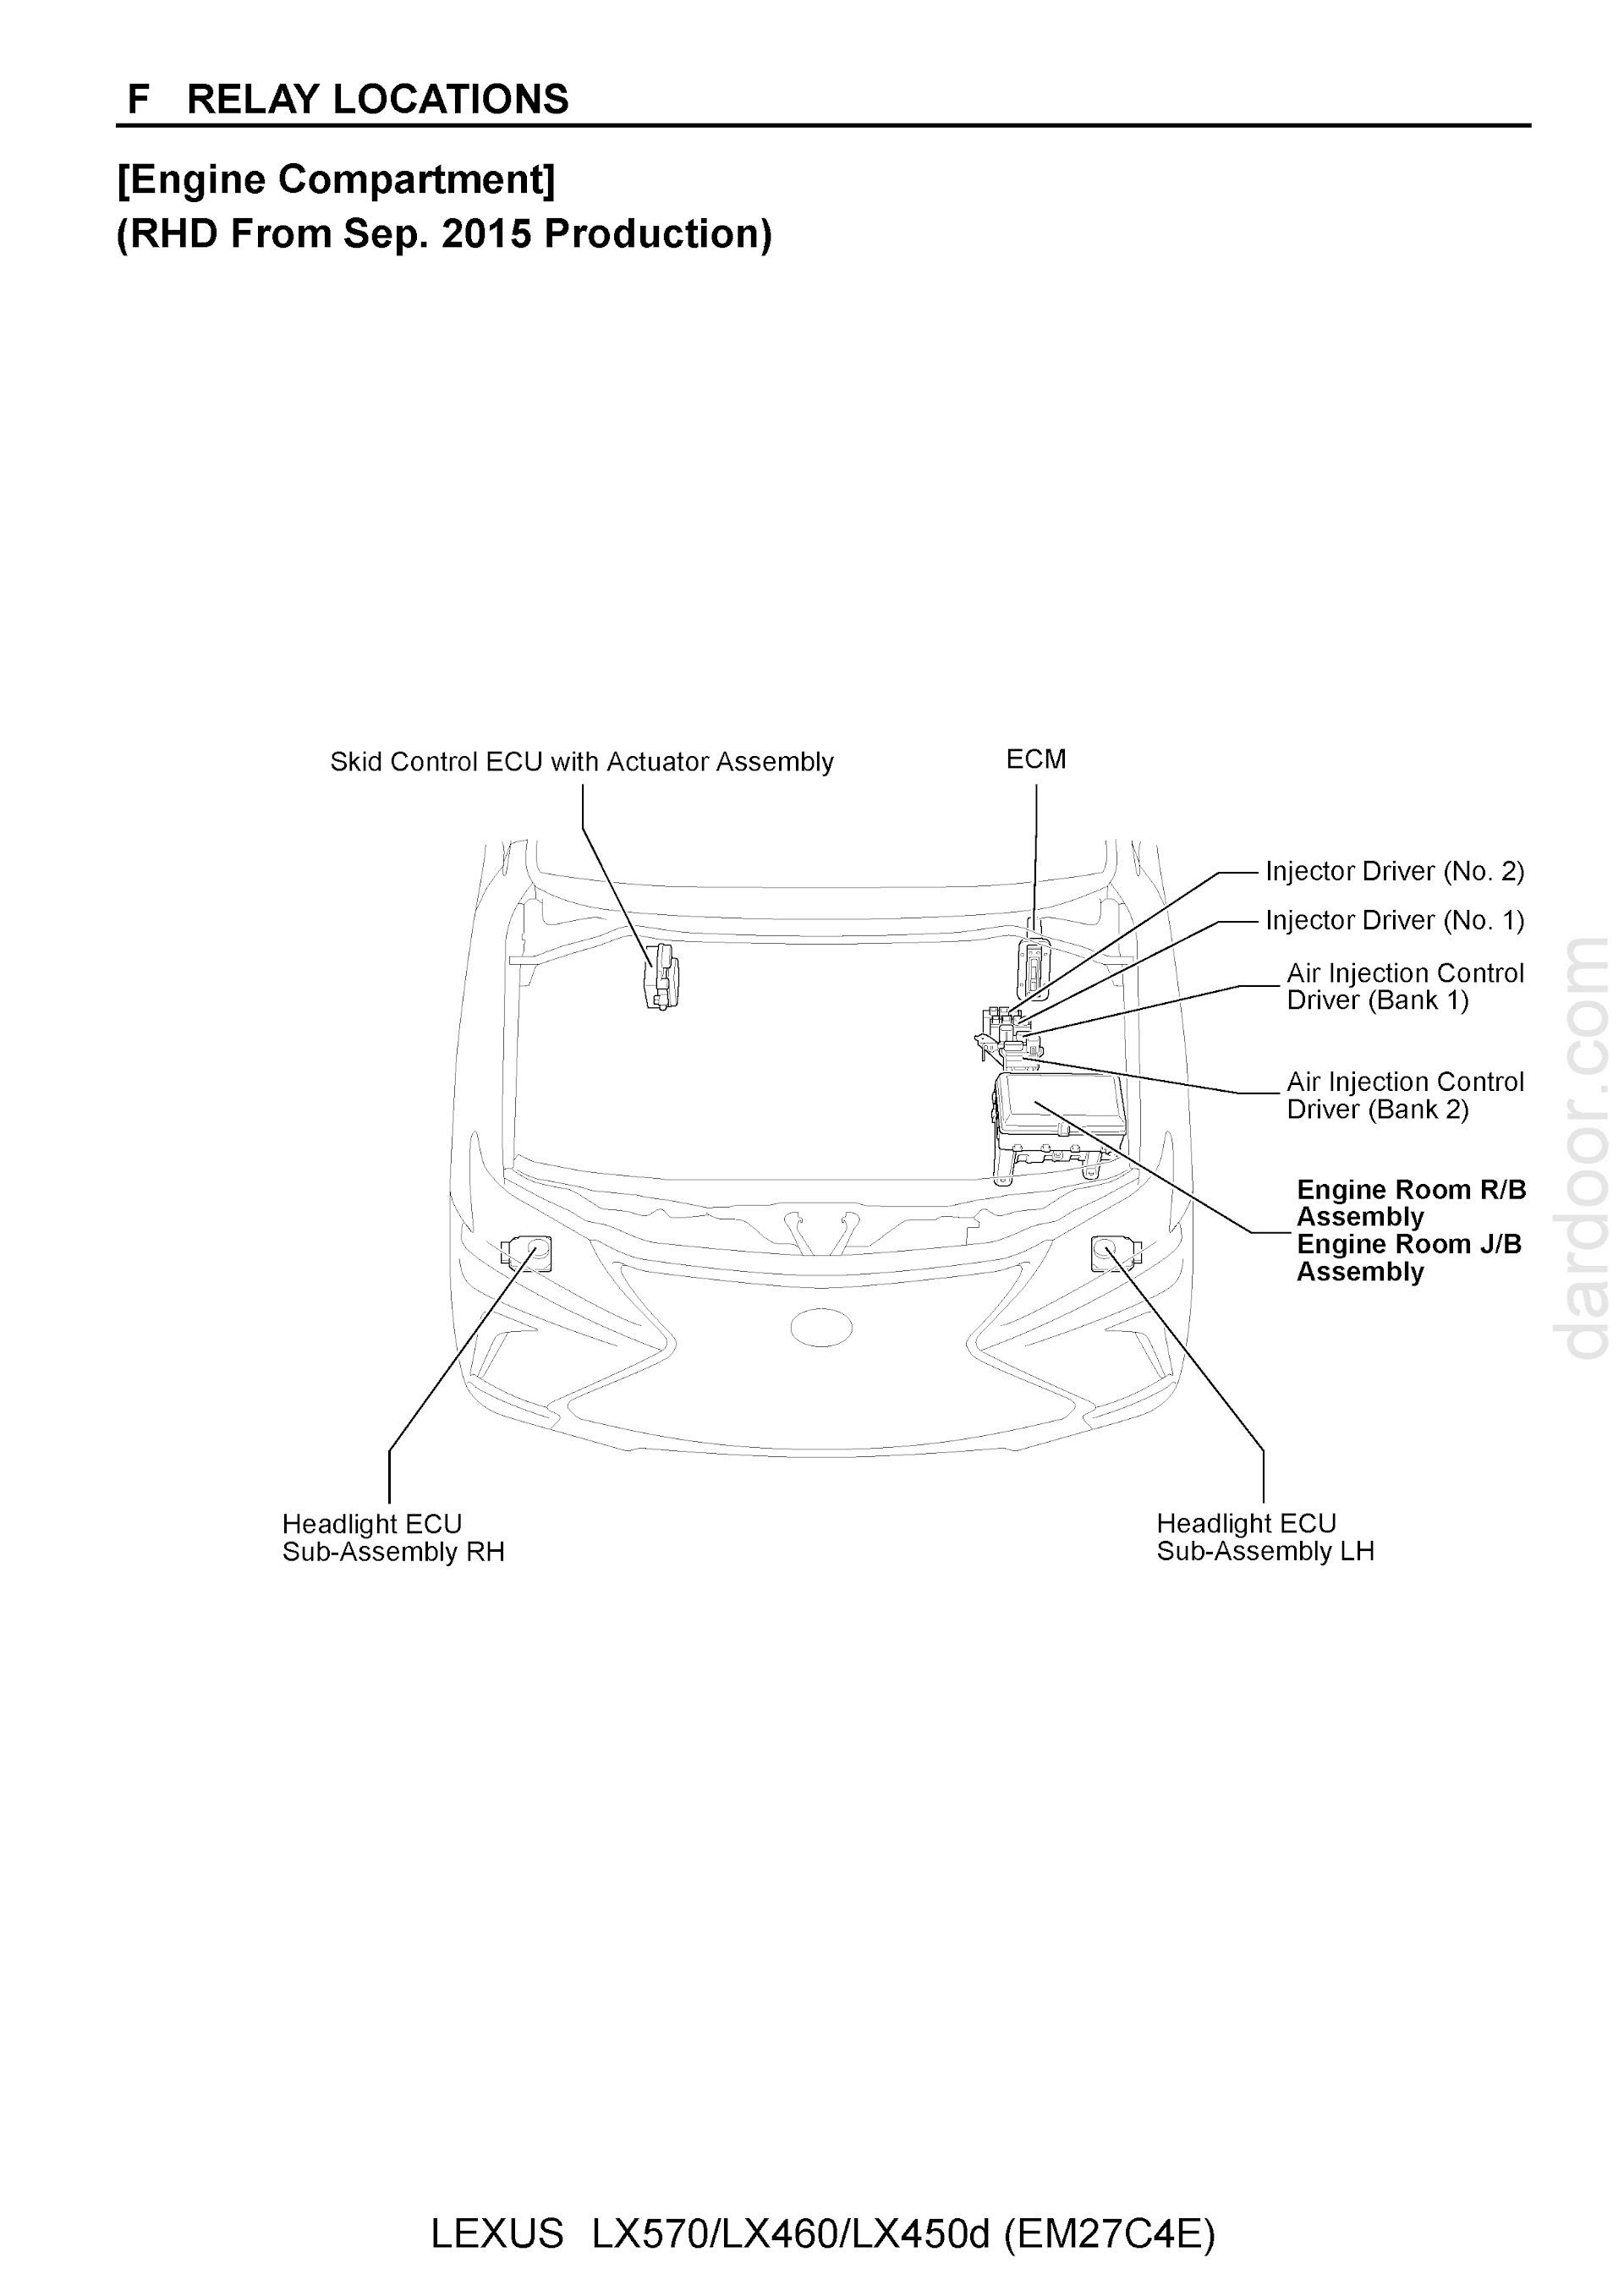 Download 2014-2018 Lexus LX570 / LX460 Wiring Diagrams.